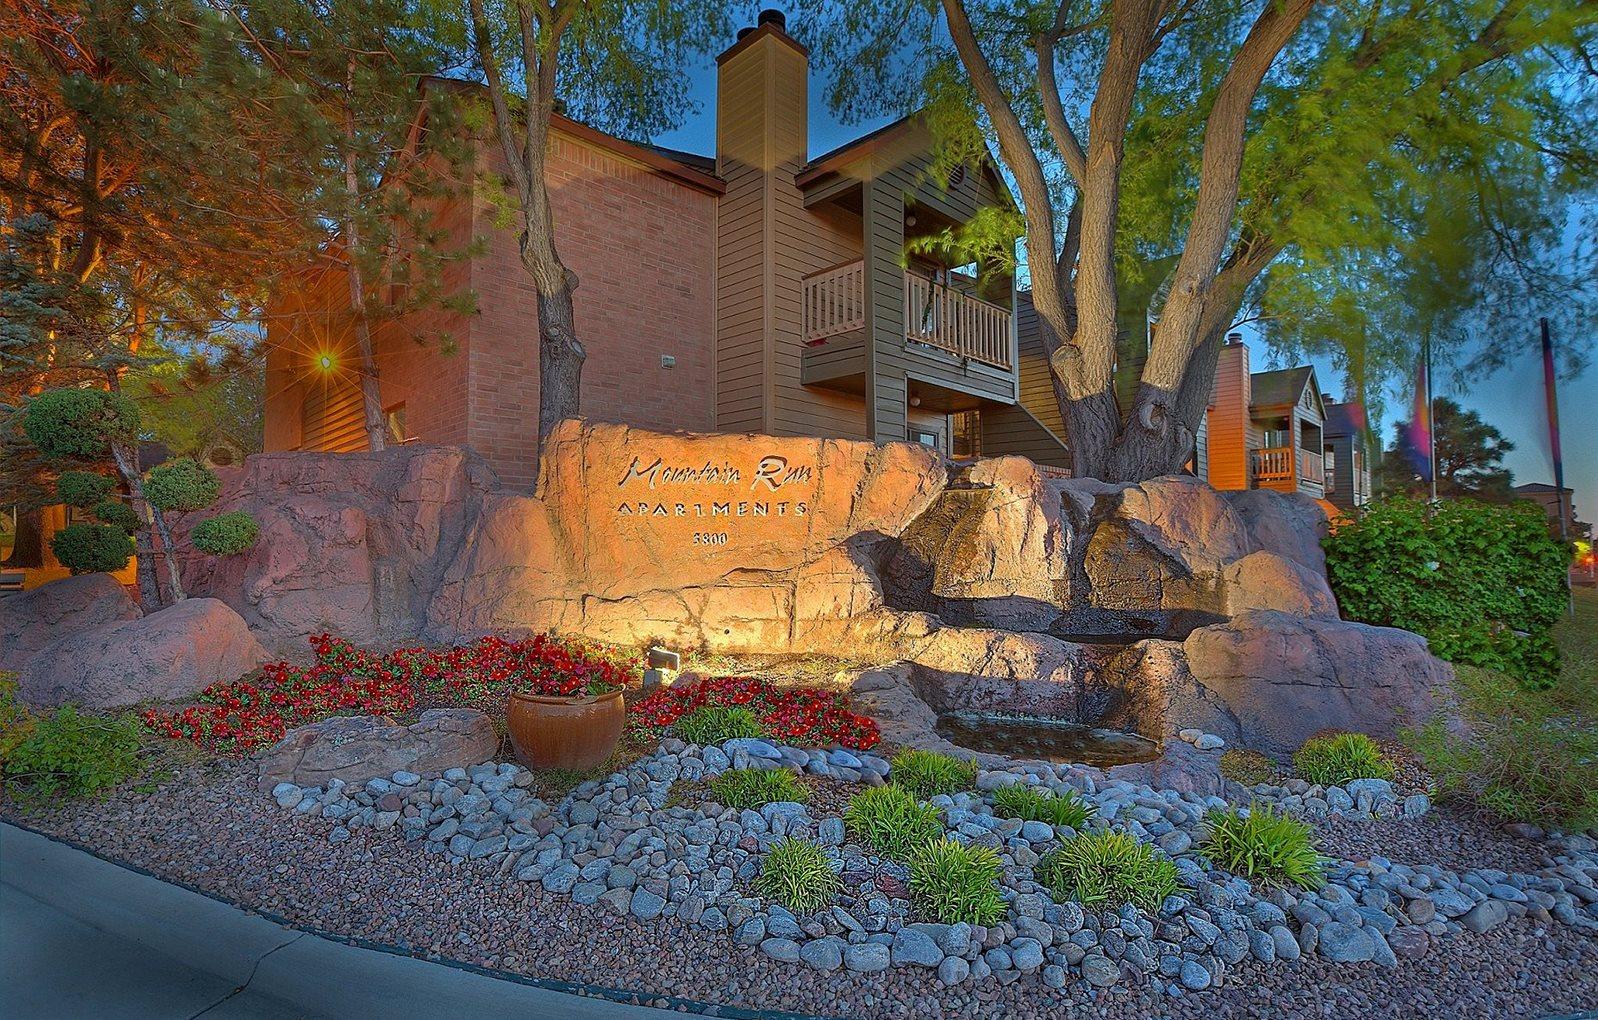 Apartments For Rent In Albuquerque Nm Mountain Run